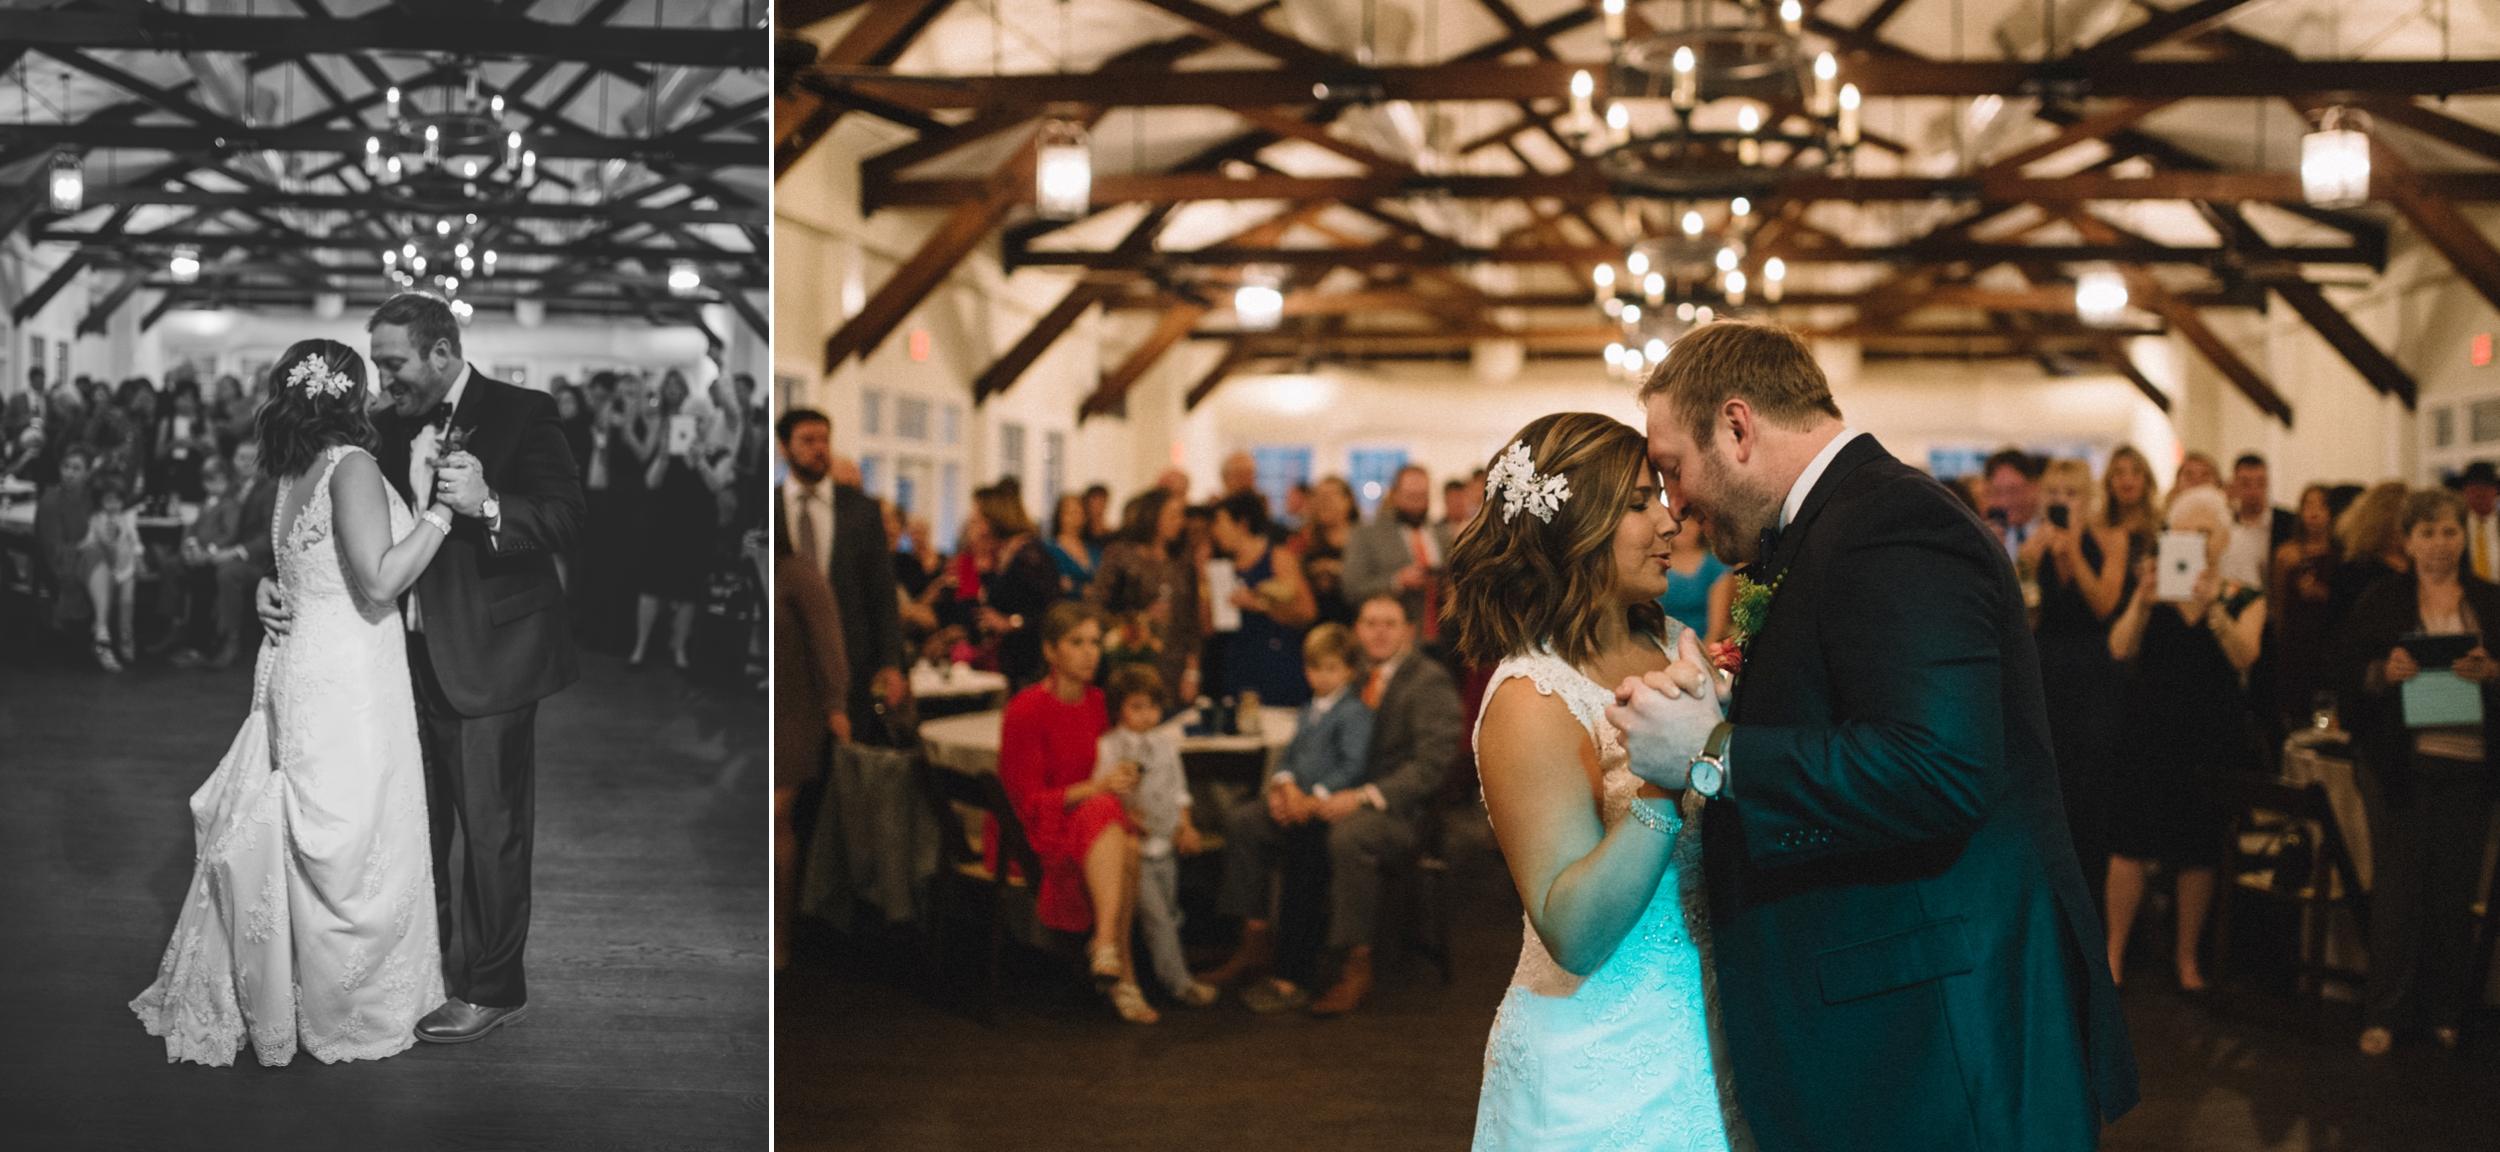 Charleston-wedding-photographer-95.jpg